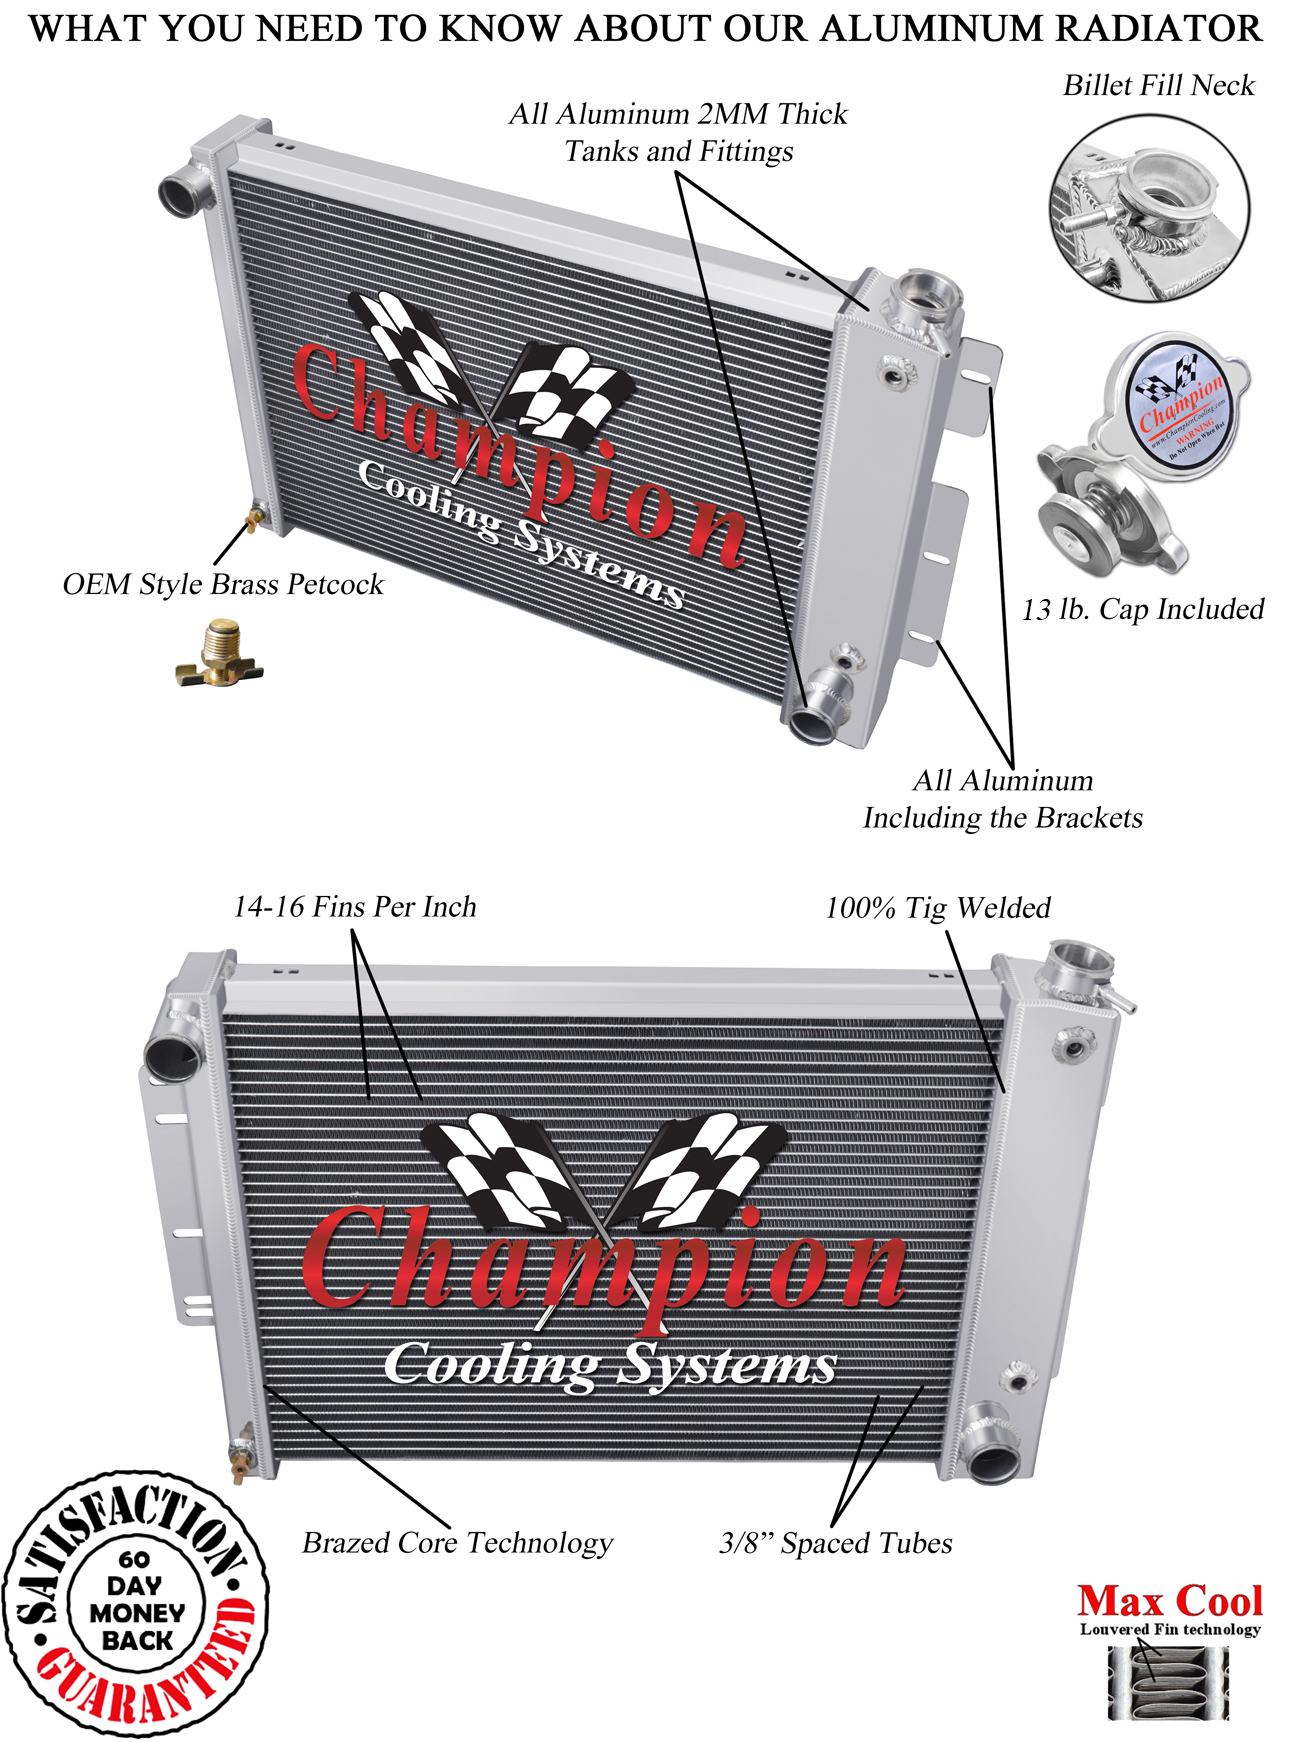 champion cooling dr mc370 aluminum radiator big block cooling 4 champion cooling systems mc370 aluminum radiator big block cooling 4 row core